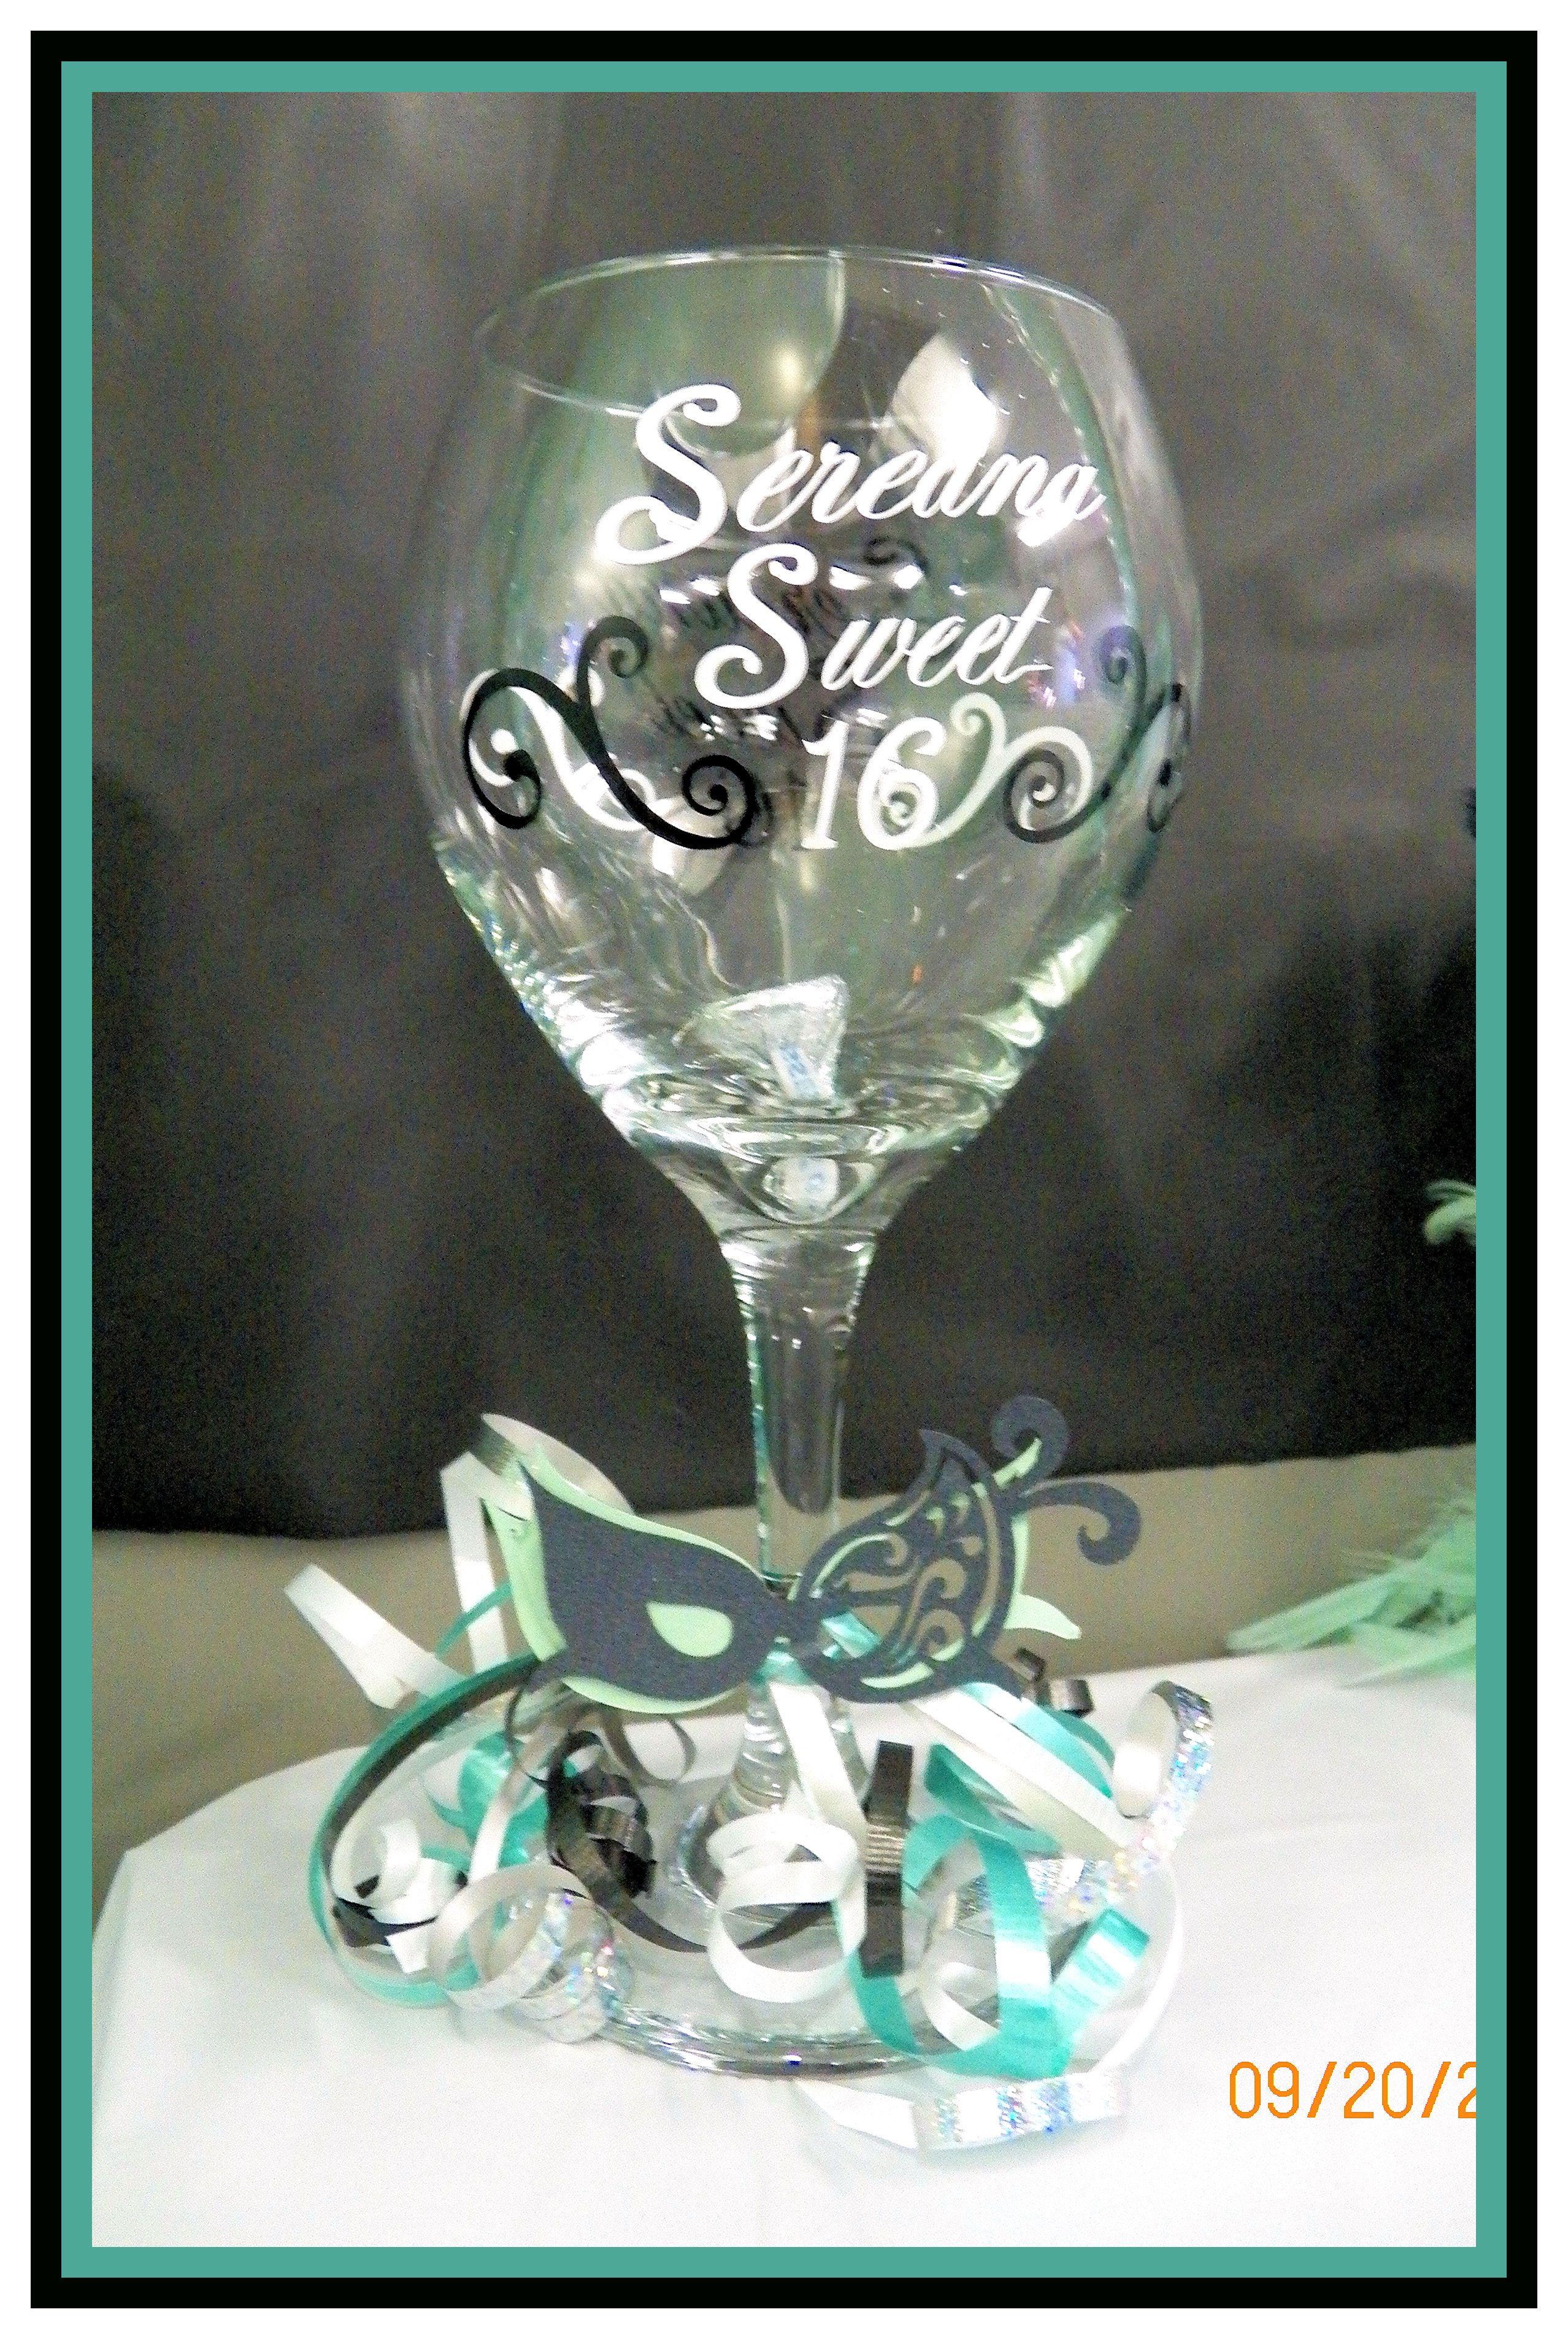 17c26cec138 Sweet sixteen wine glass